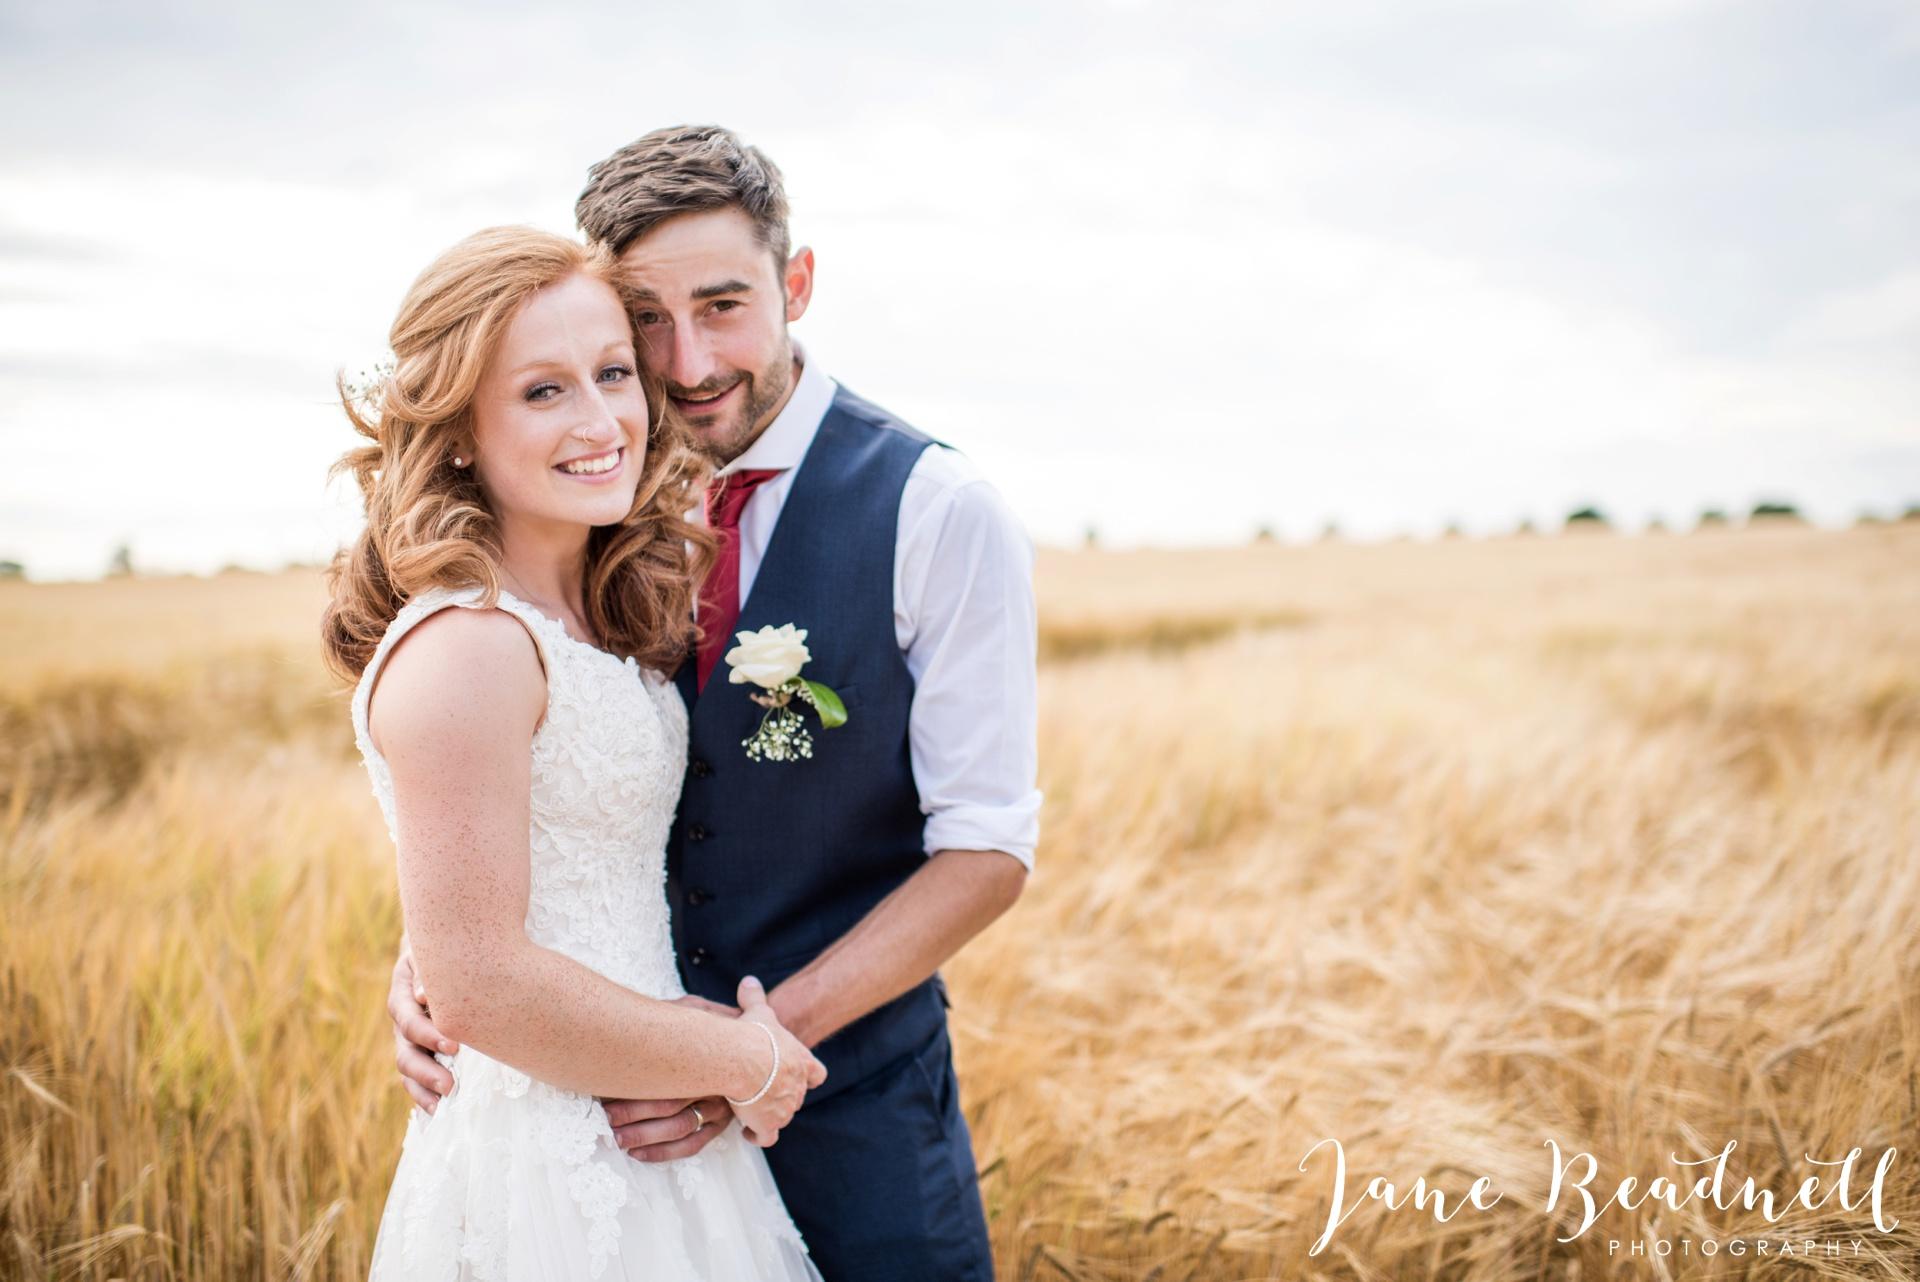 yorkshire-fine-art-wedding-photographer-jane-beadnell-photography-poppleton-york_0131